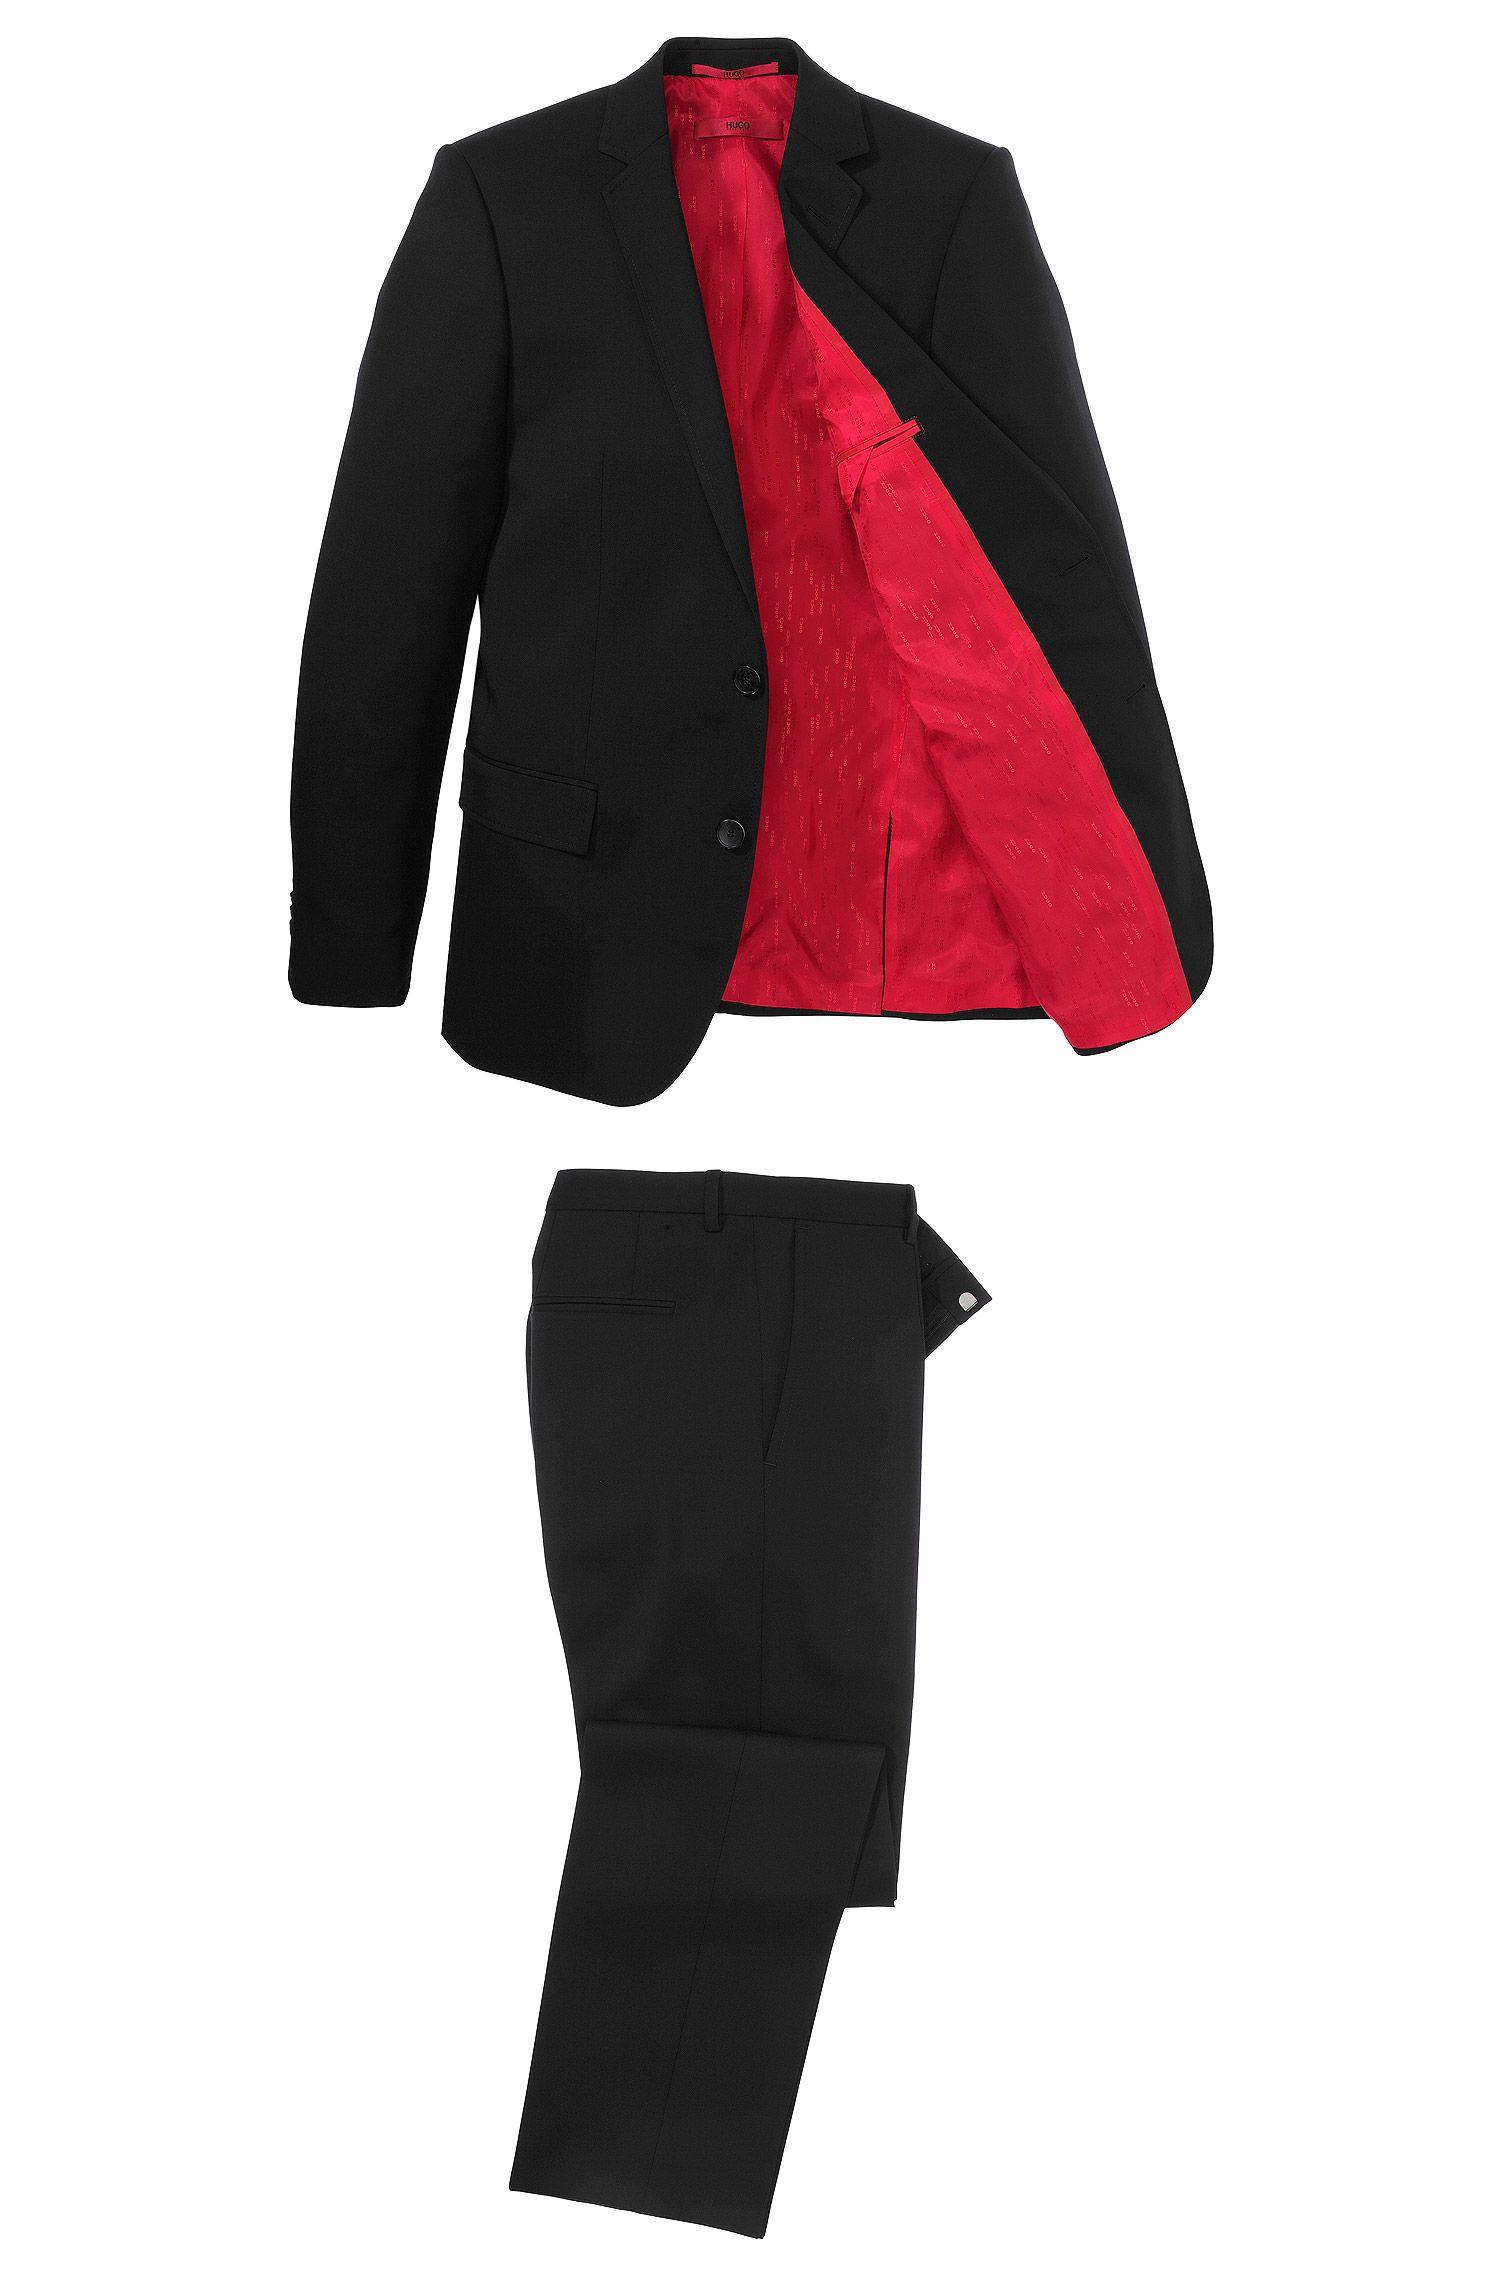 Costume Slim Fit «Aiko/Heise» en laine vierge